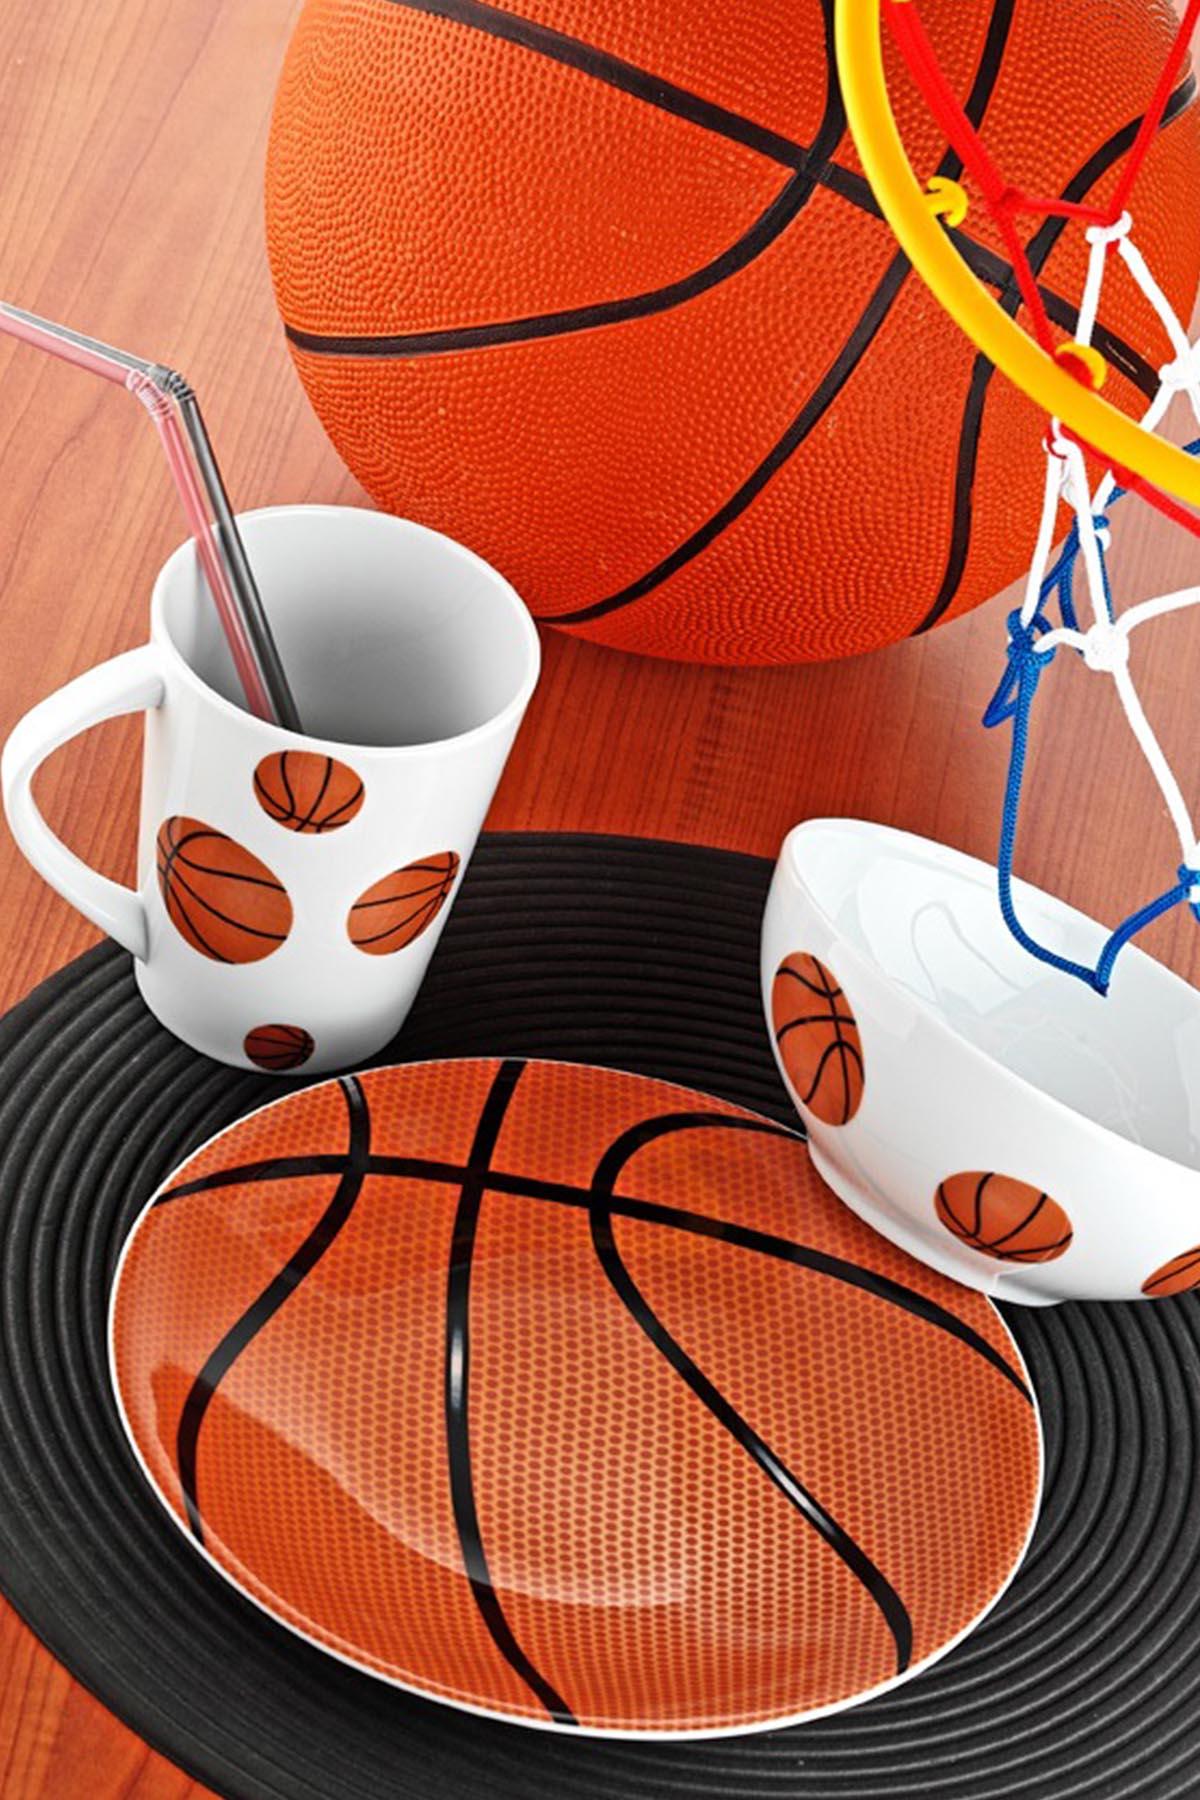 Kütahya Porselen - Kütahya Porselen Team Game Basketball Yemek Seti